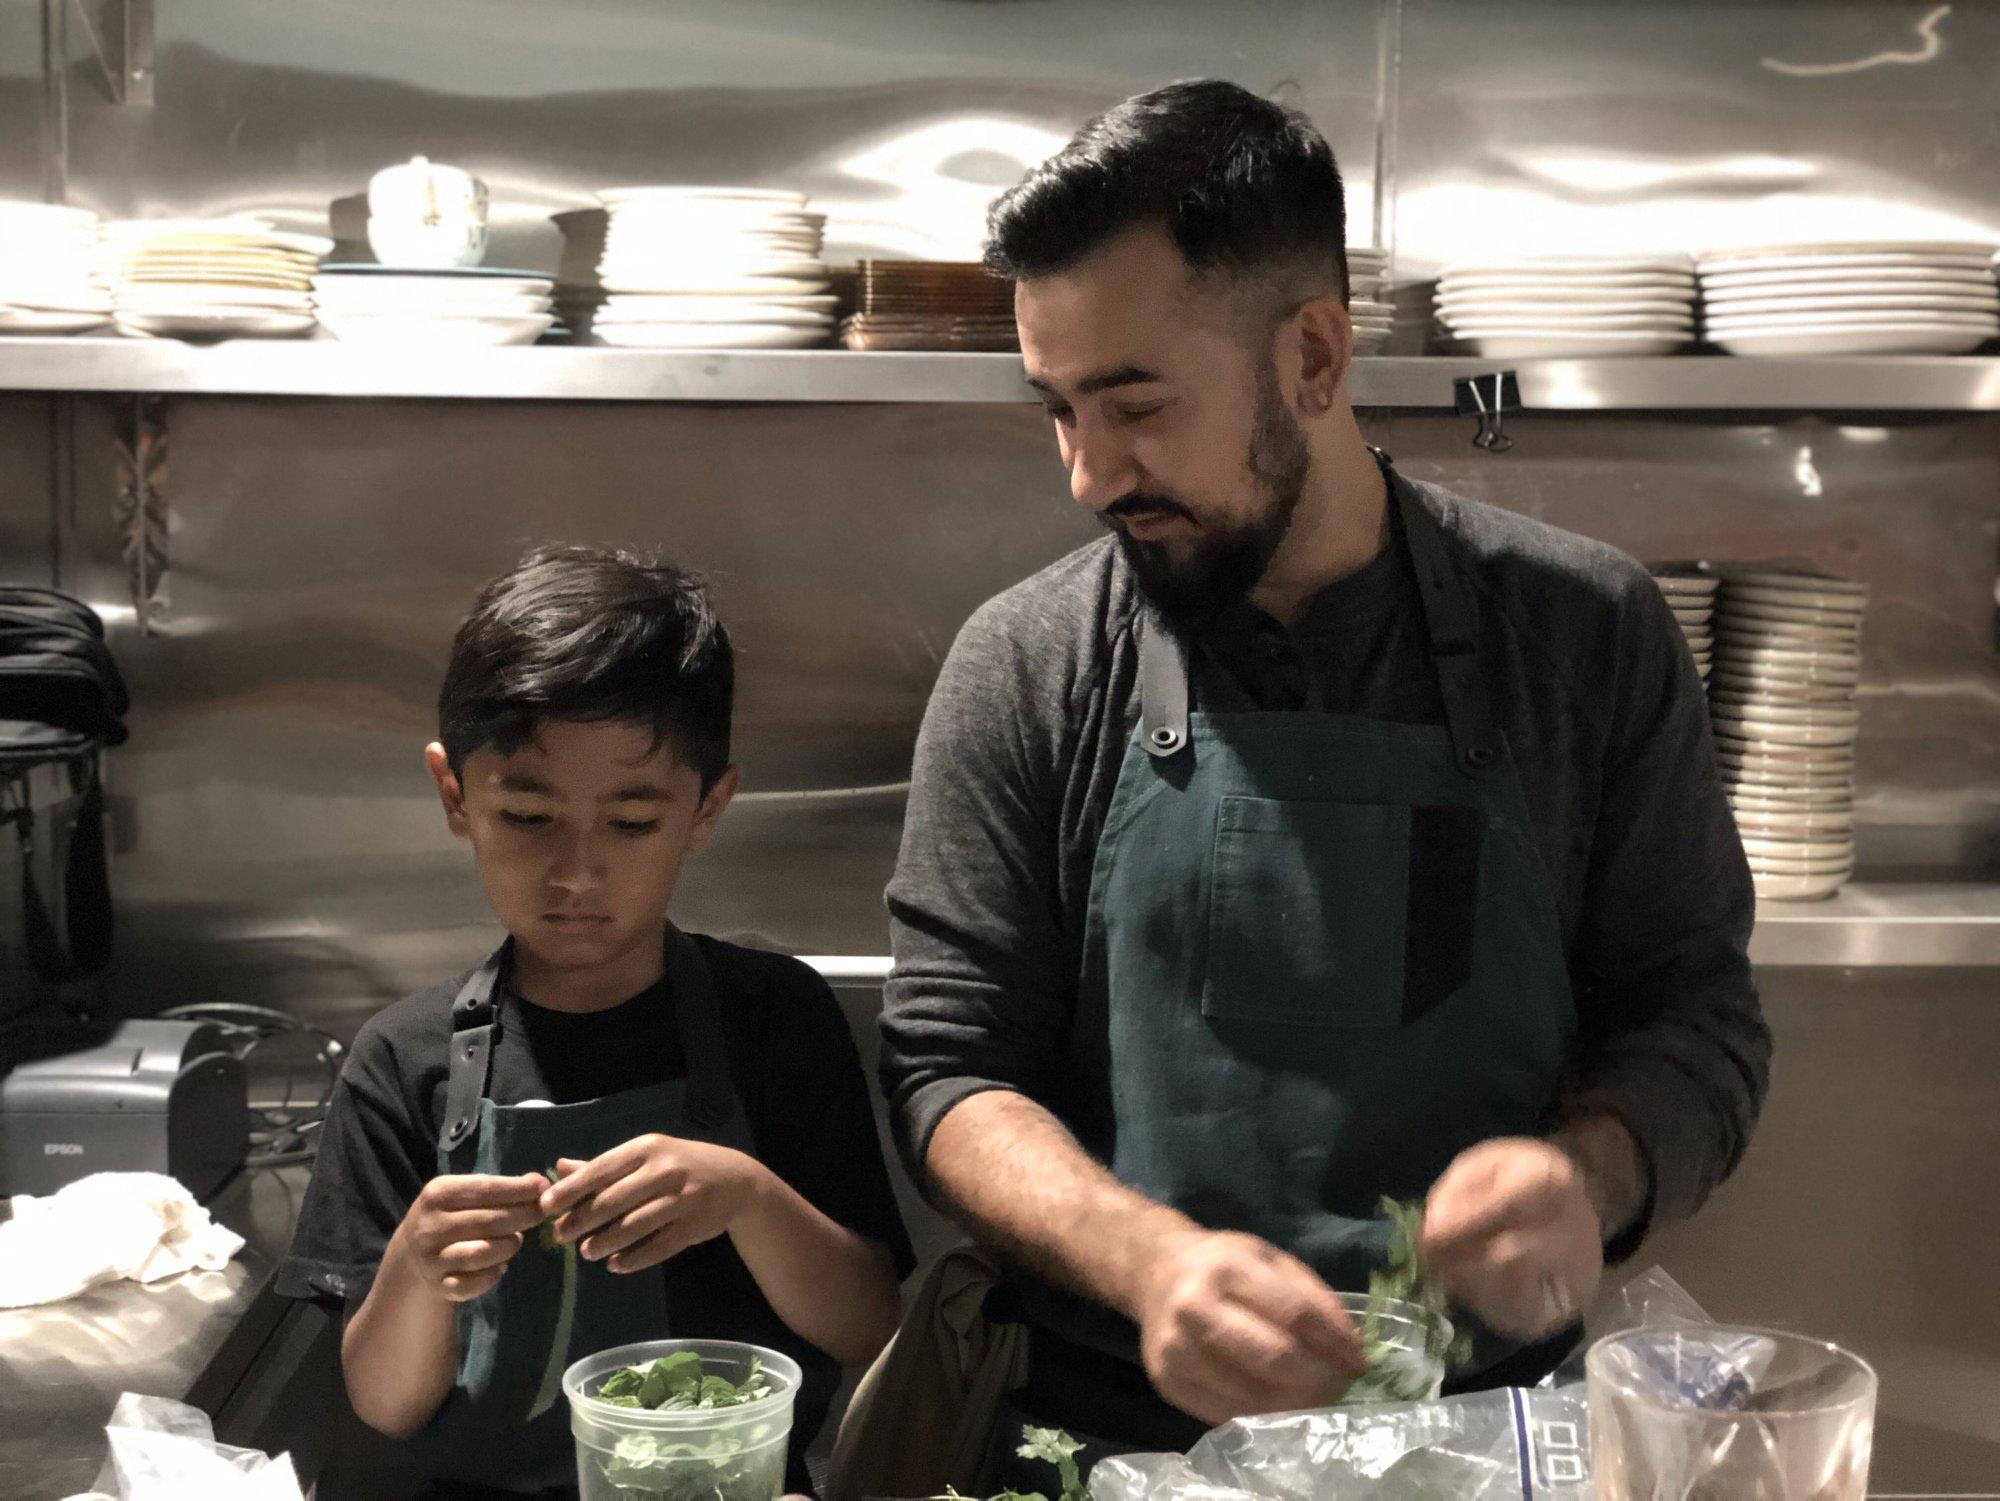 chef-anthony-salguero-rylan-popoca-oakland.jpg